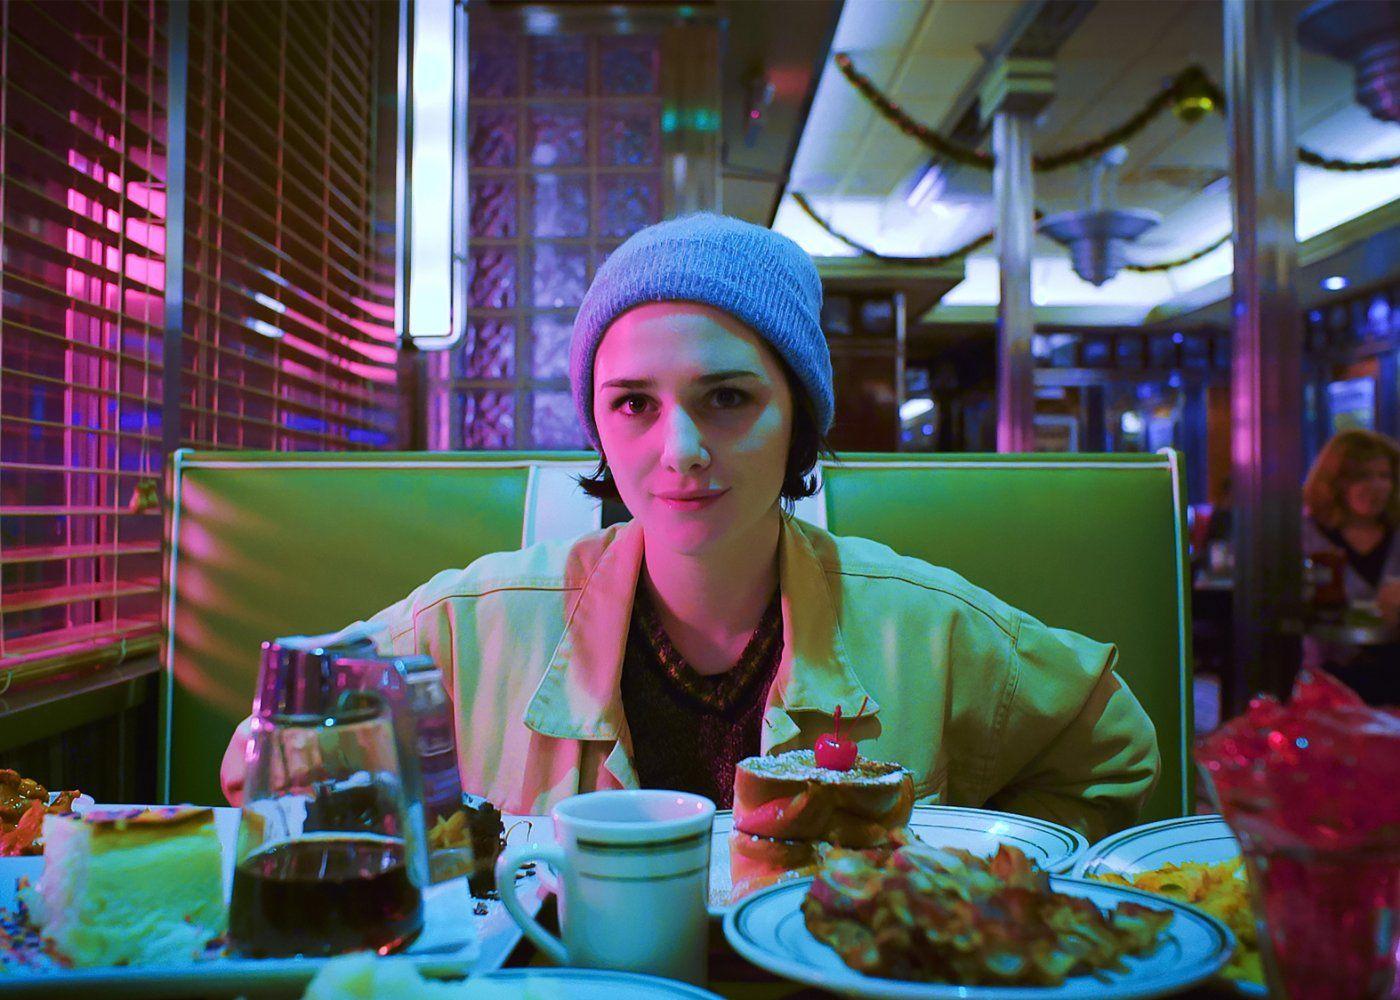 Addison Timlin in Like Me (2017)